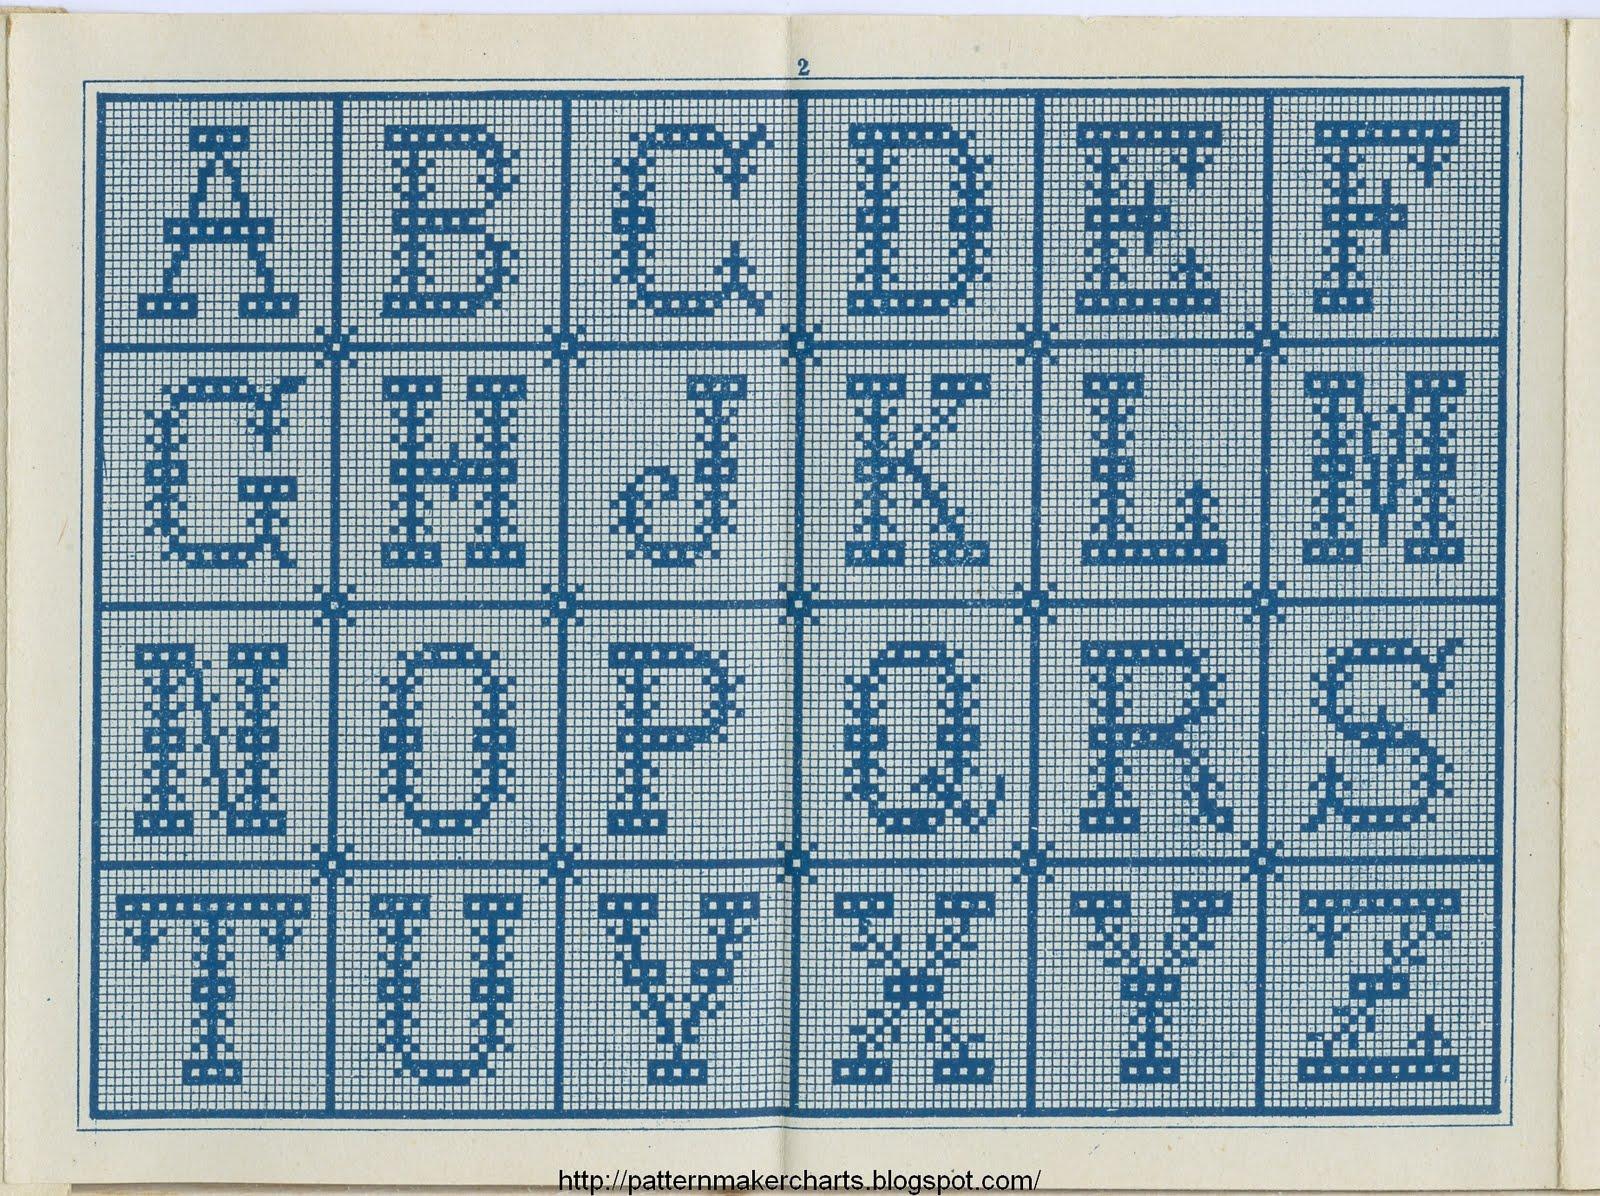 Free easy cross pattern maker pcstitch charts free historic old pattern books sajou no 108 - Sticken vorlagen kostenlos ...